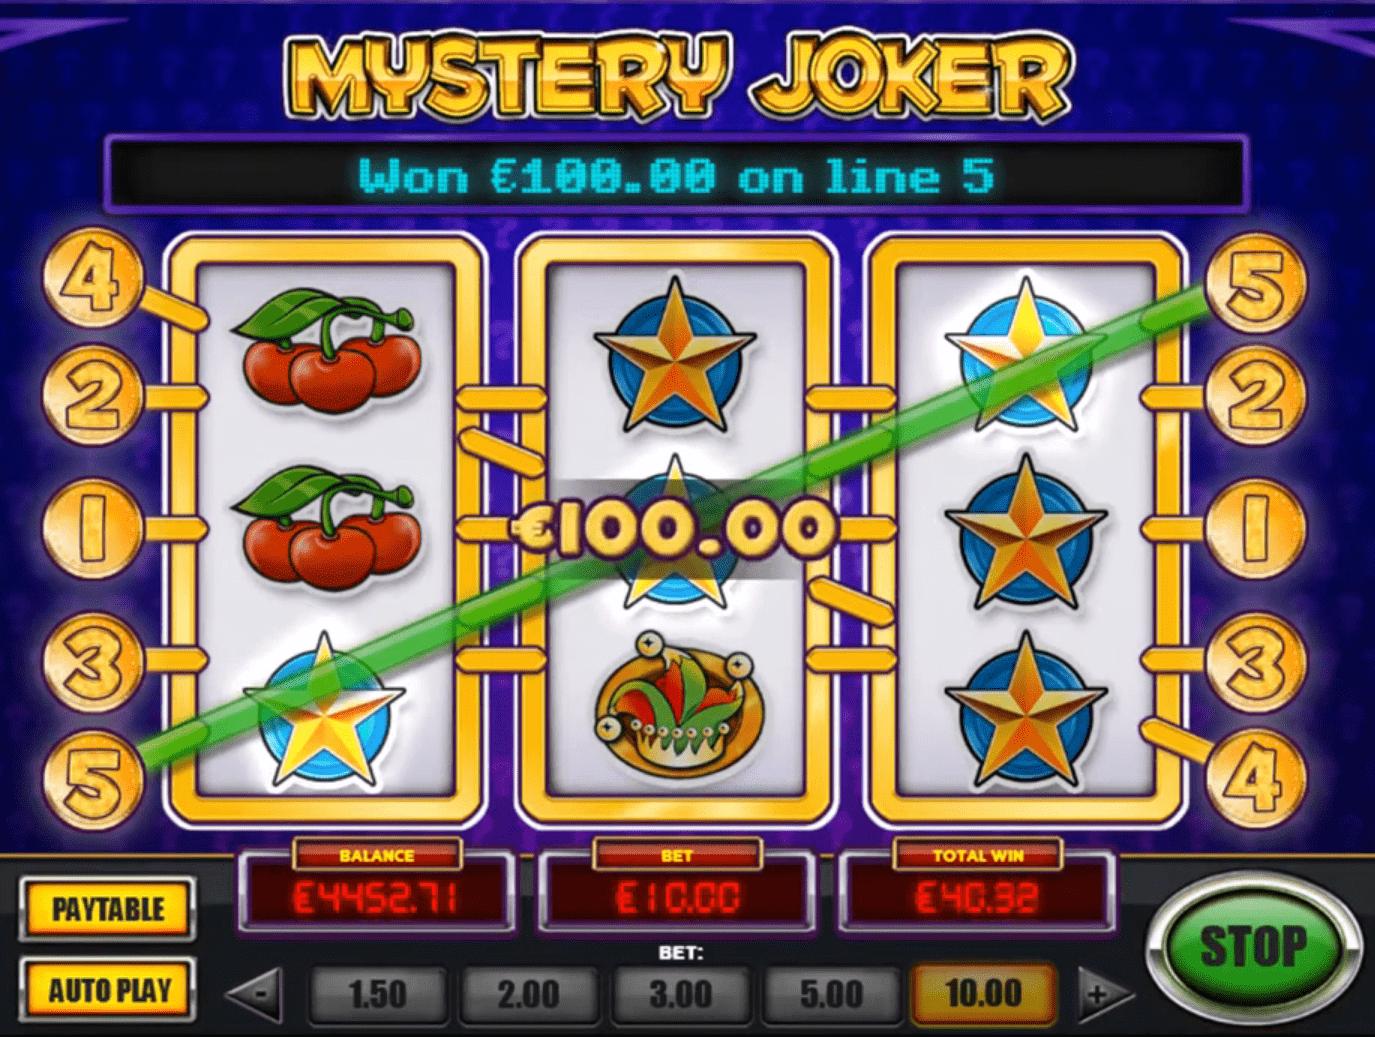 Mystery Joker Slot How to Play